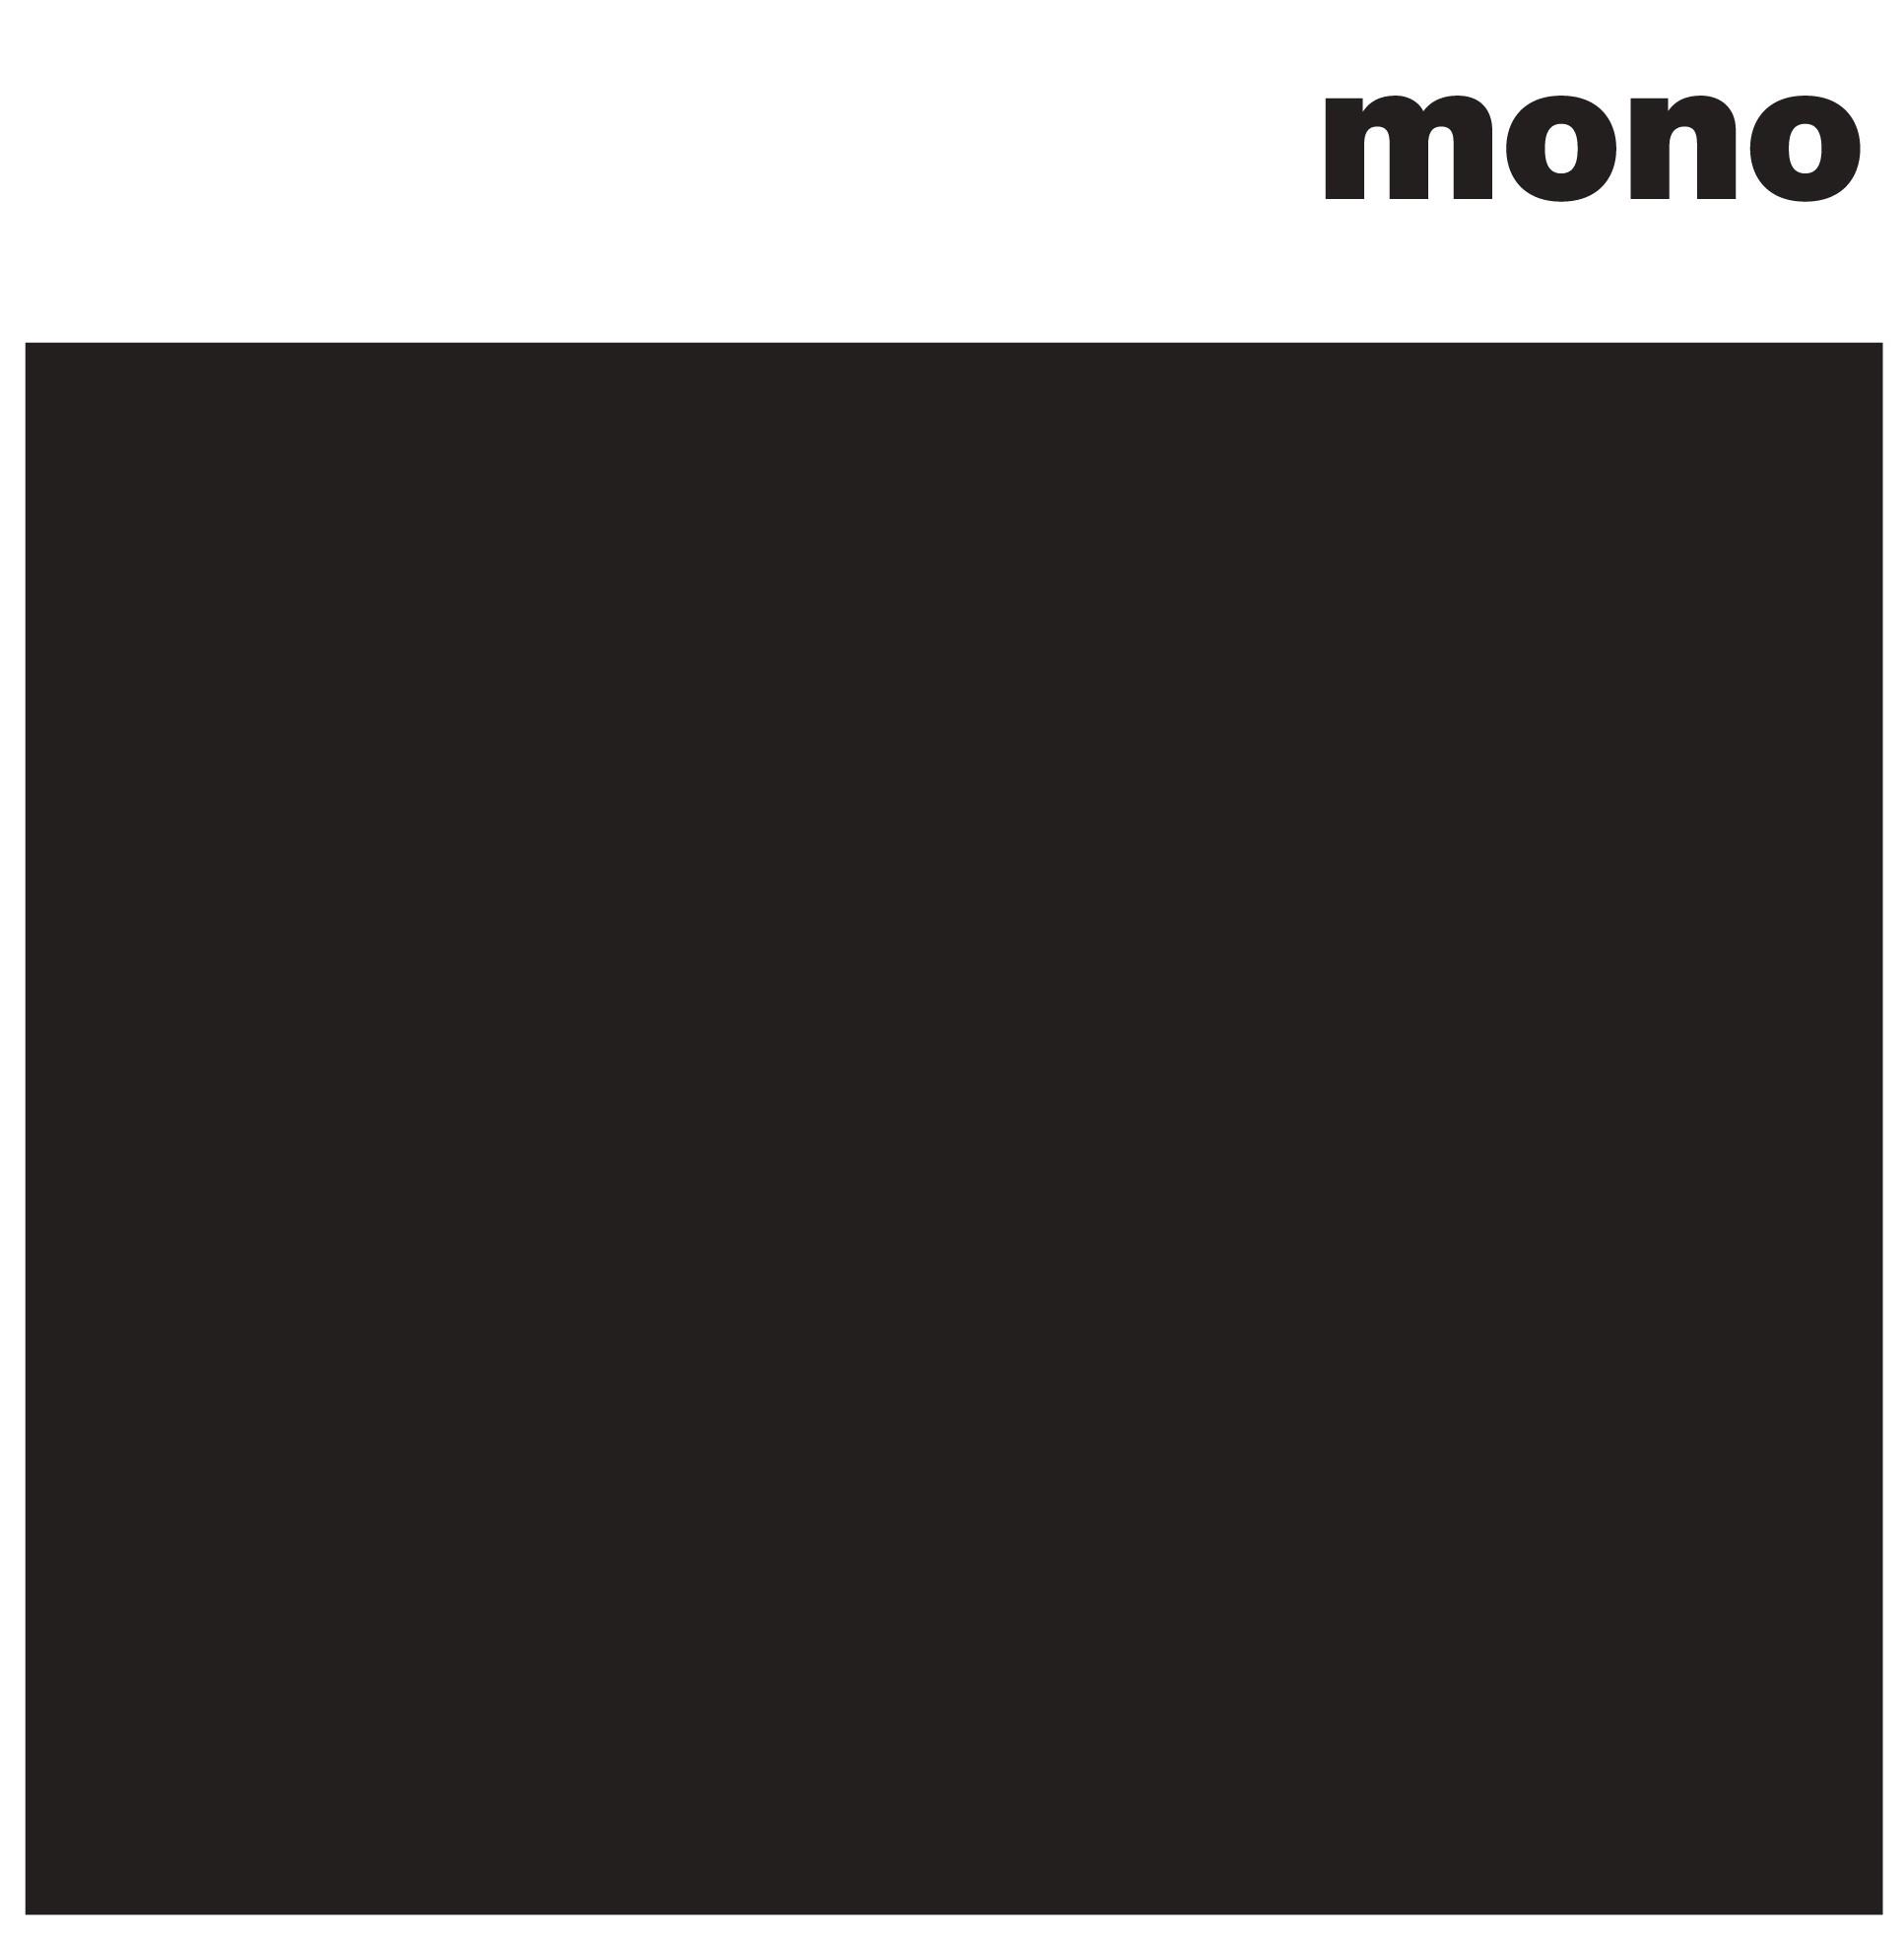 logo_mono.jpg